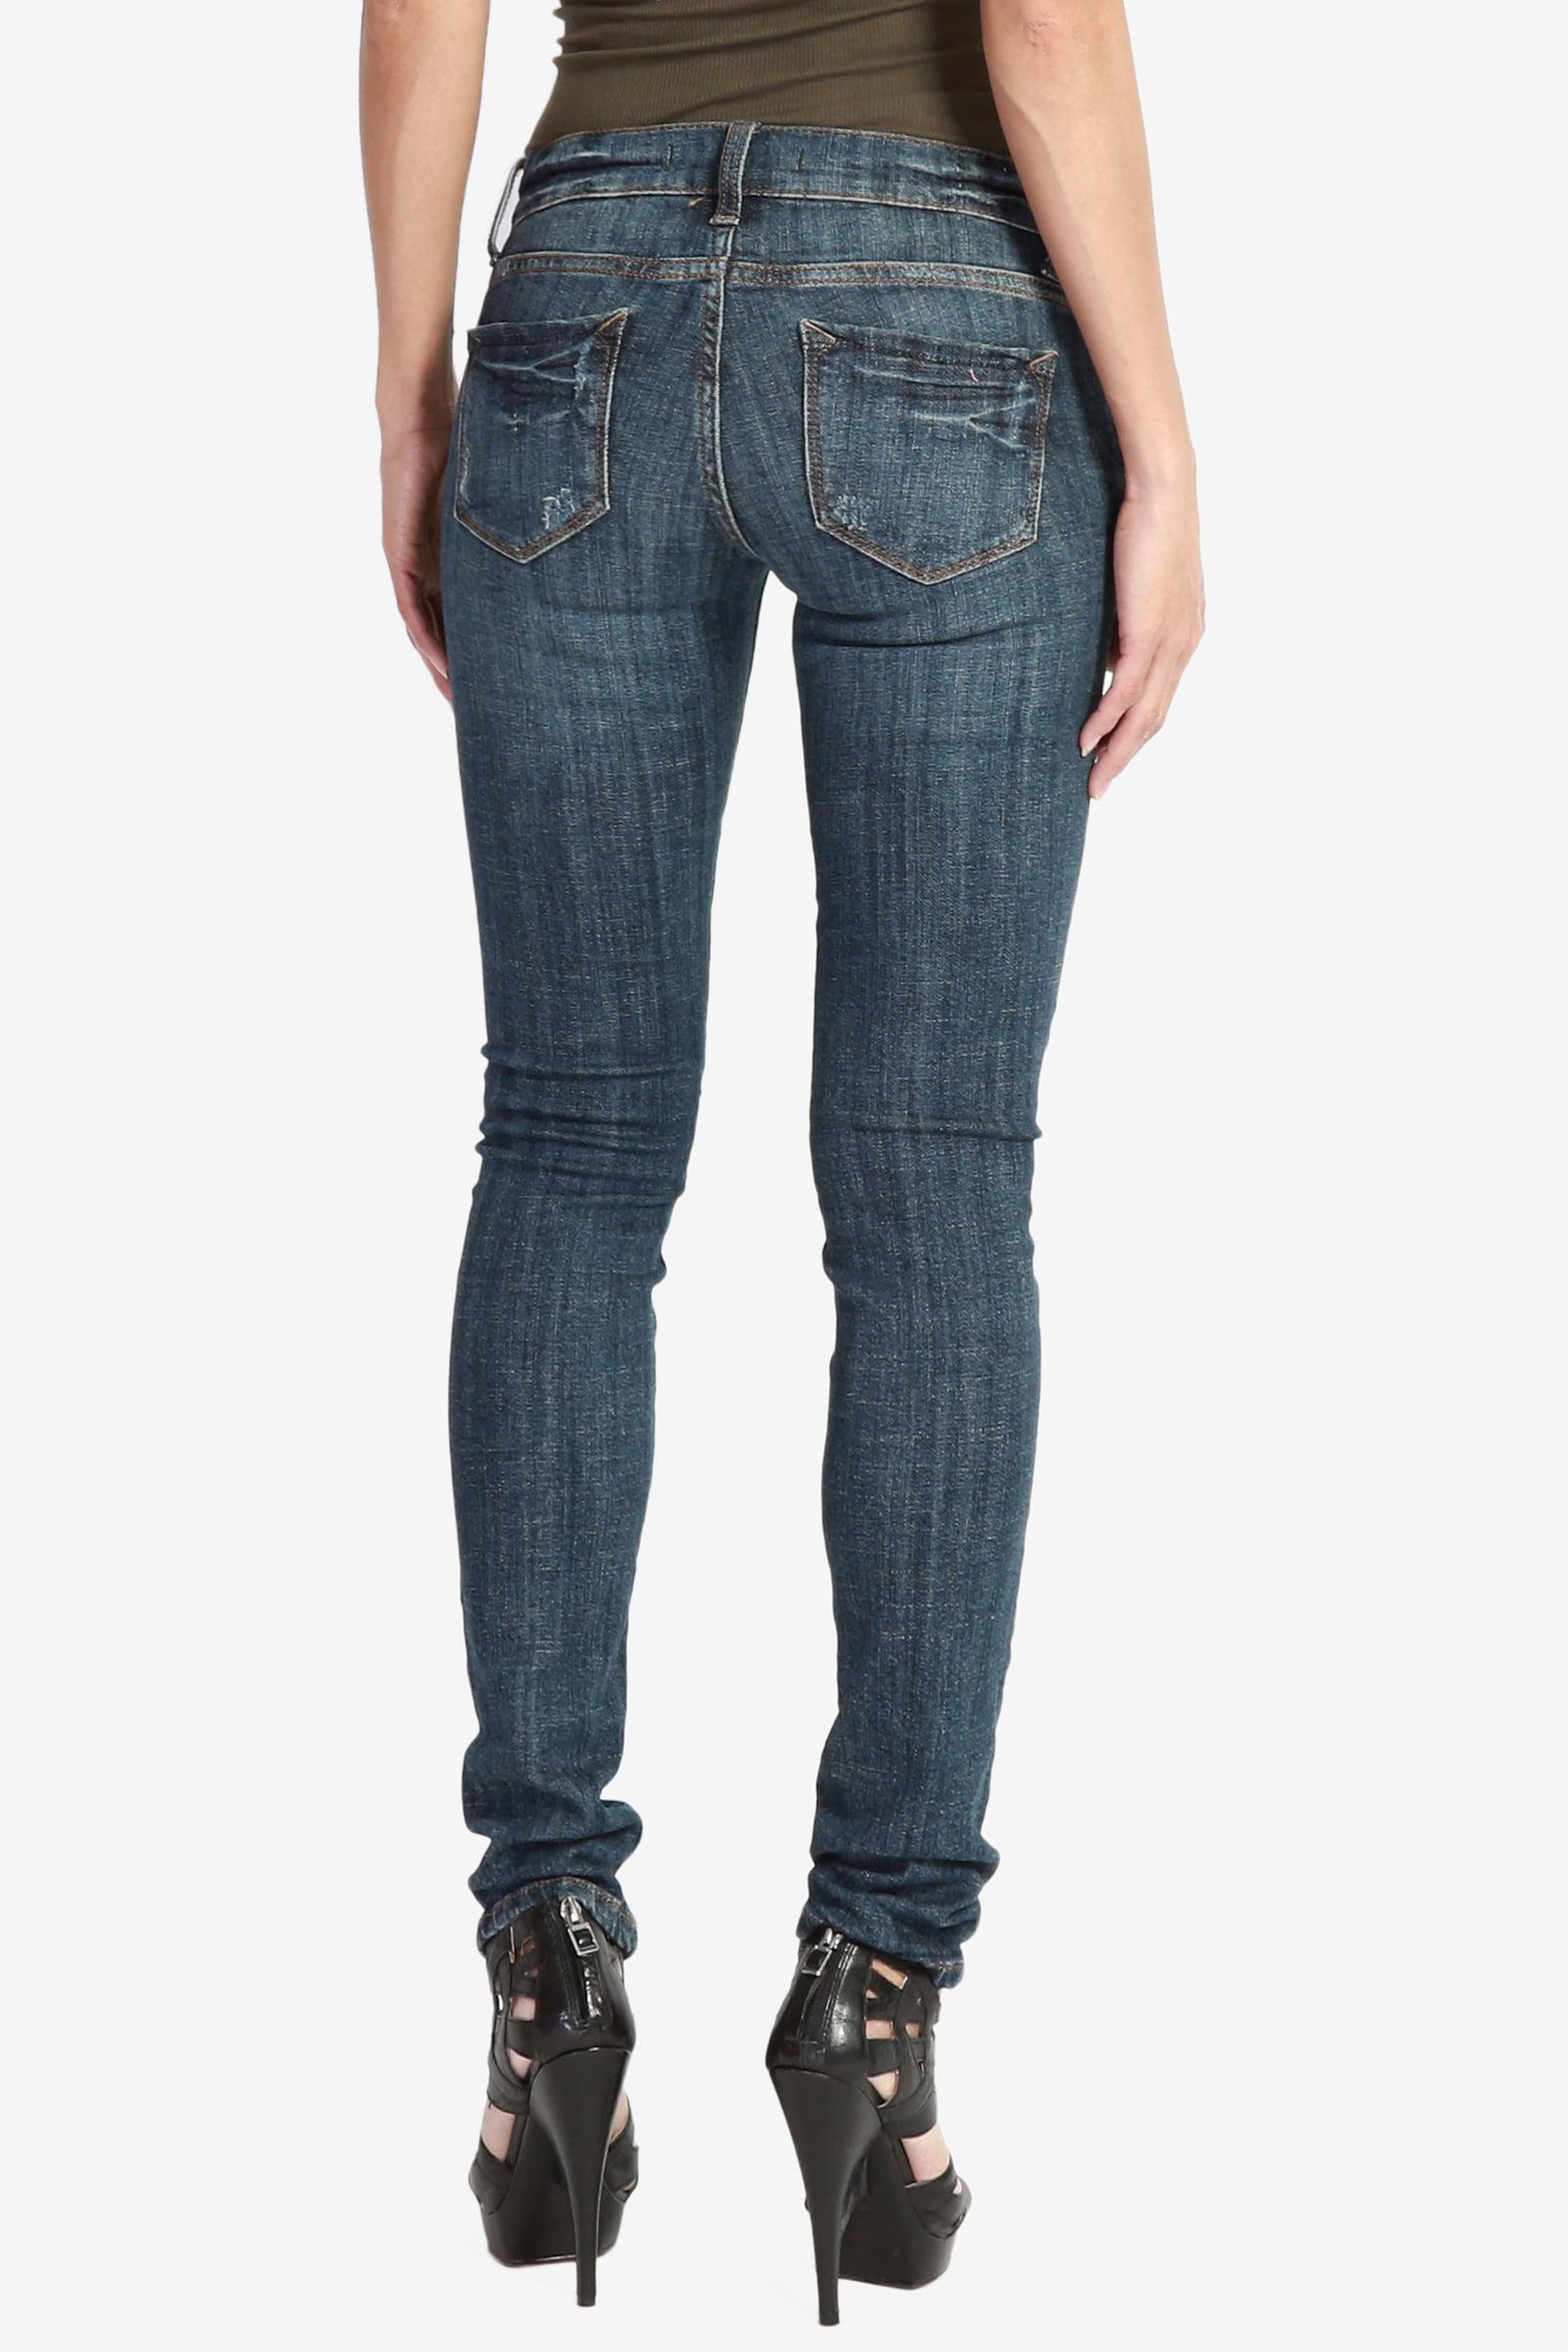 f80323dc8a TheMogan Women s Slim Fit Dark Wash Stretch Skinny Jeans Dark 7 -  Walmart.com